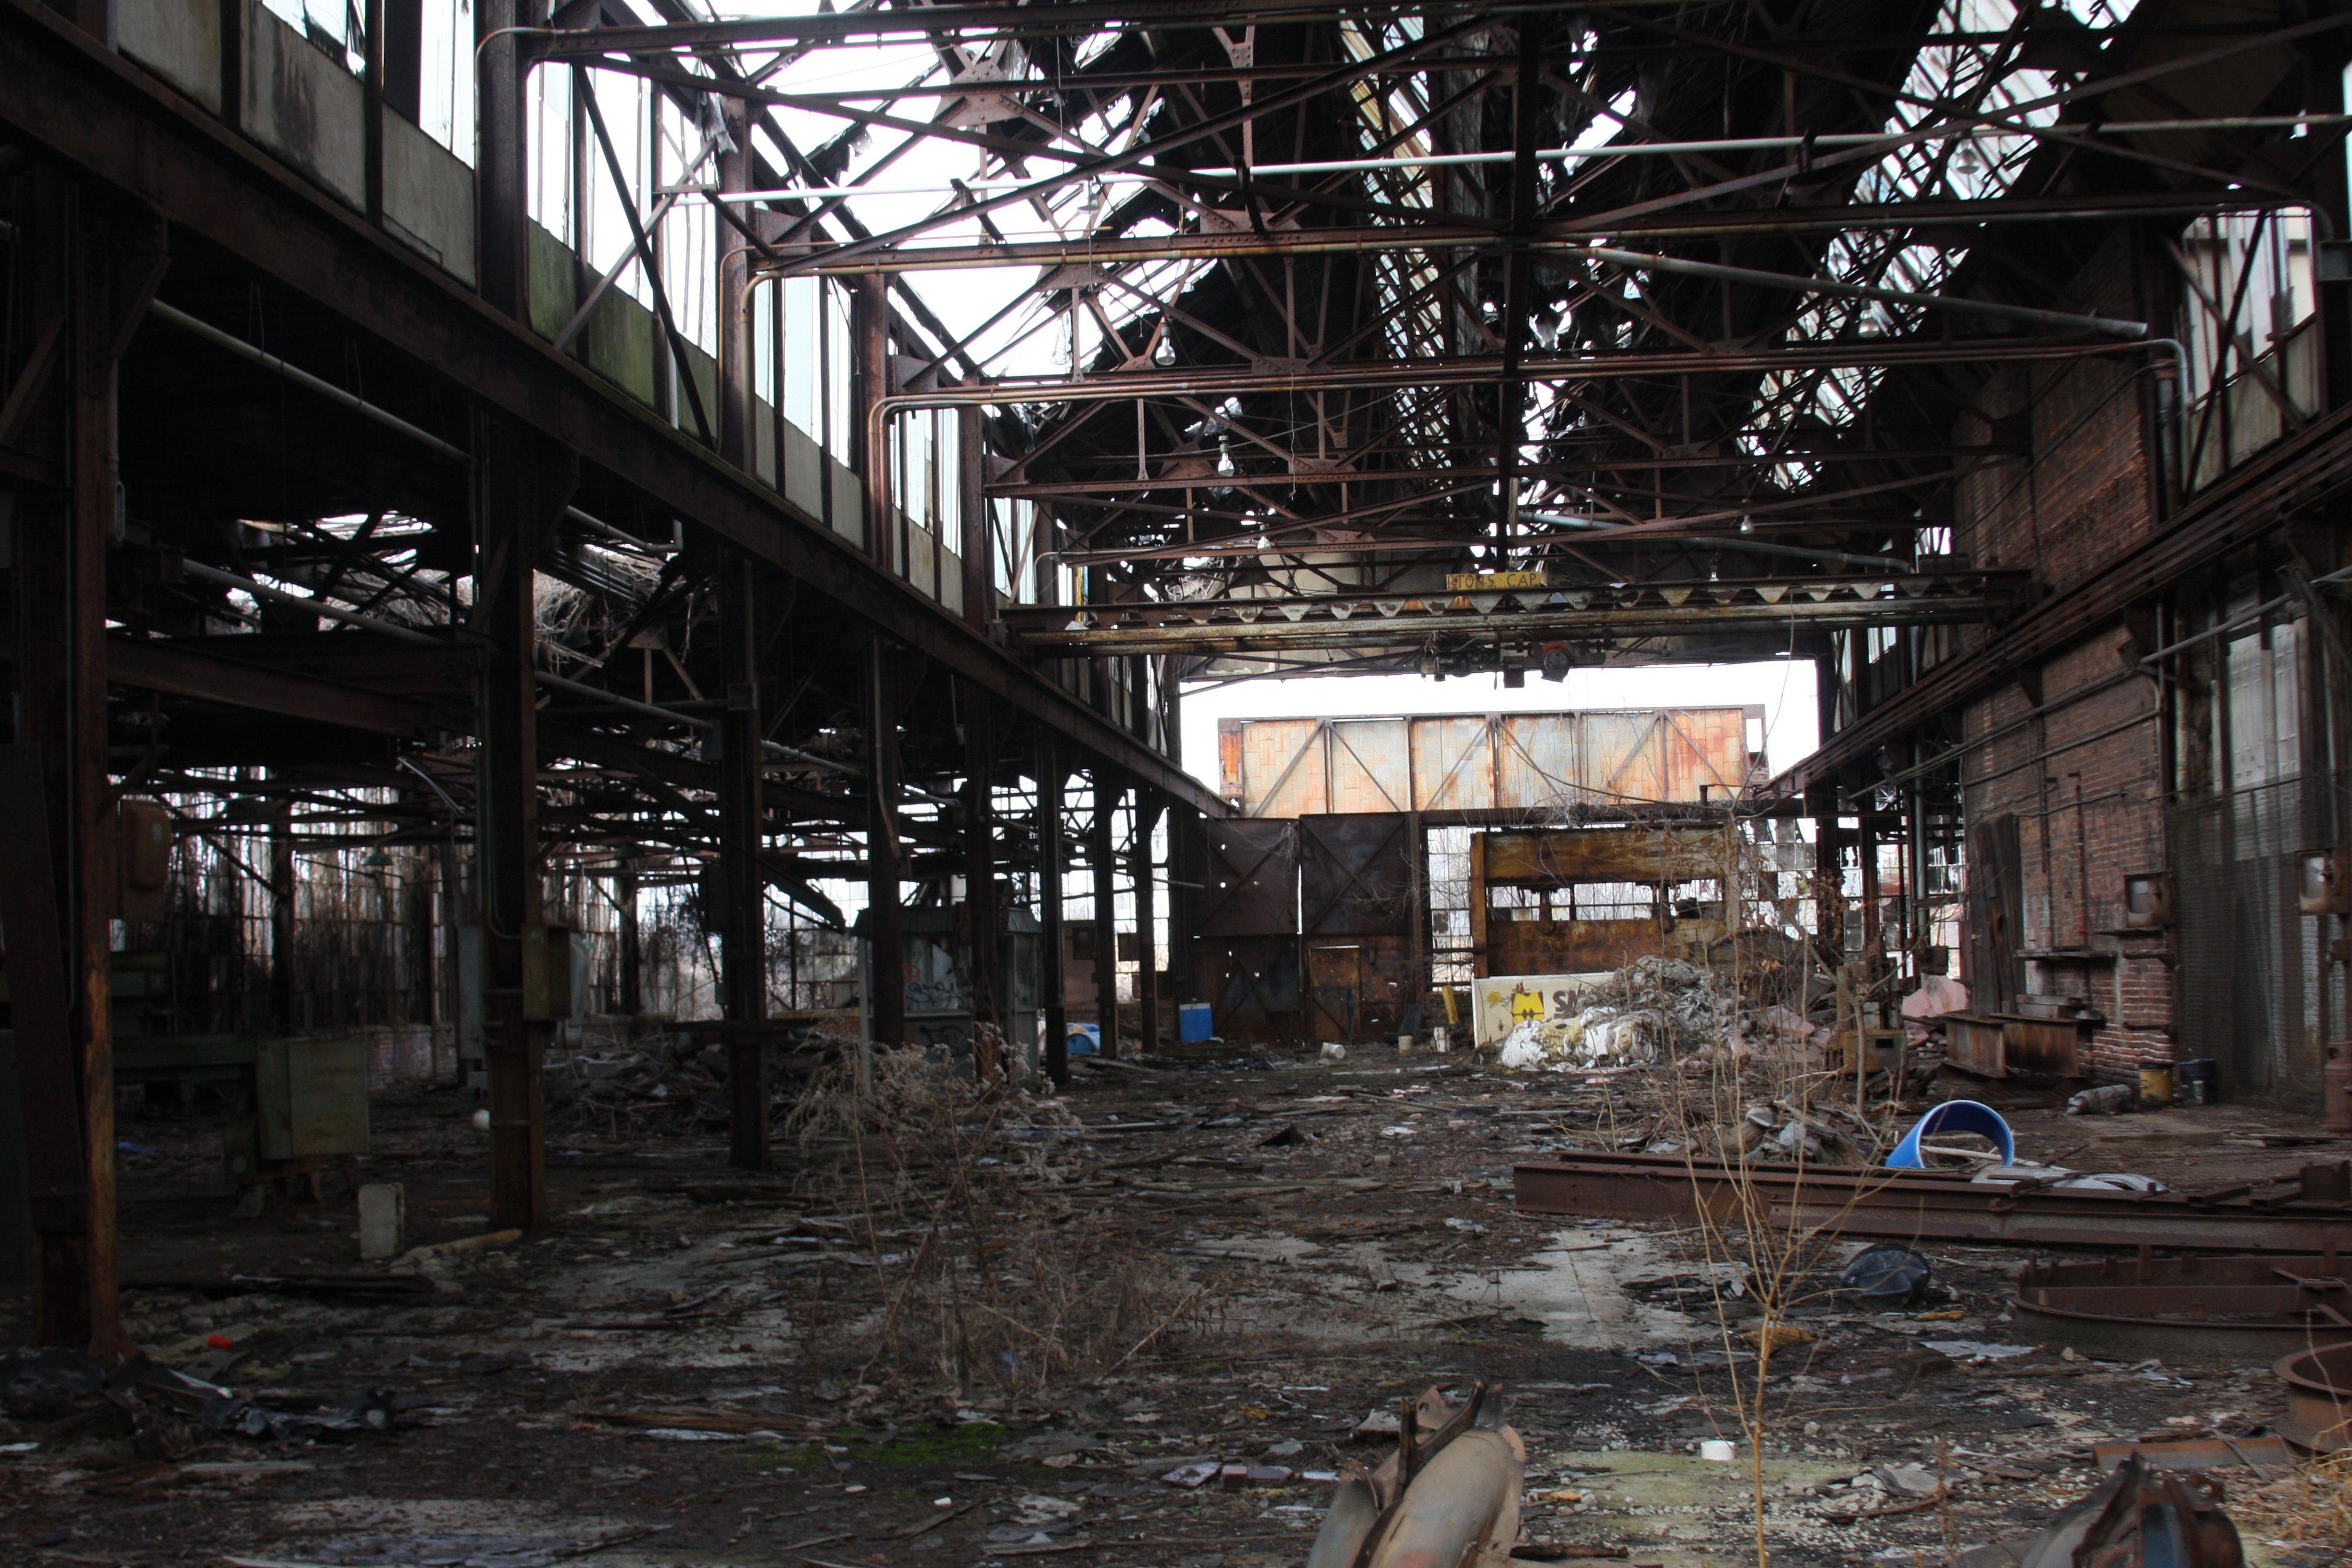 Abandoned-Warehouse-at-The-Goat-Farm-Atlanta.jpg (3888×2592 ...